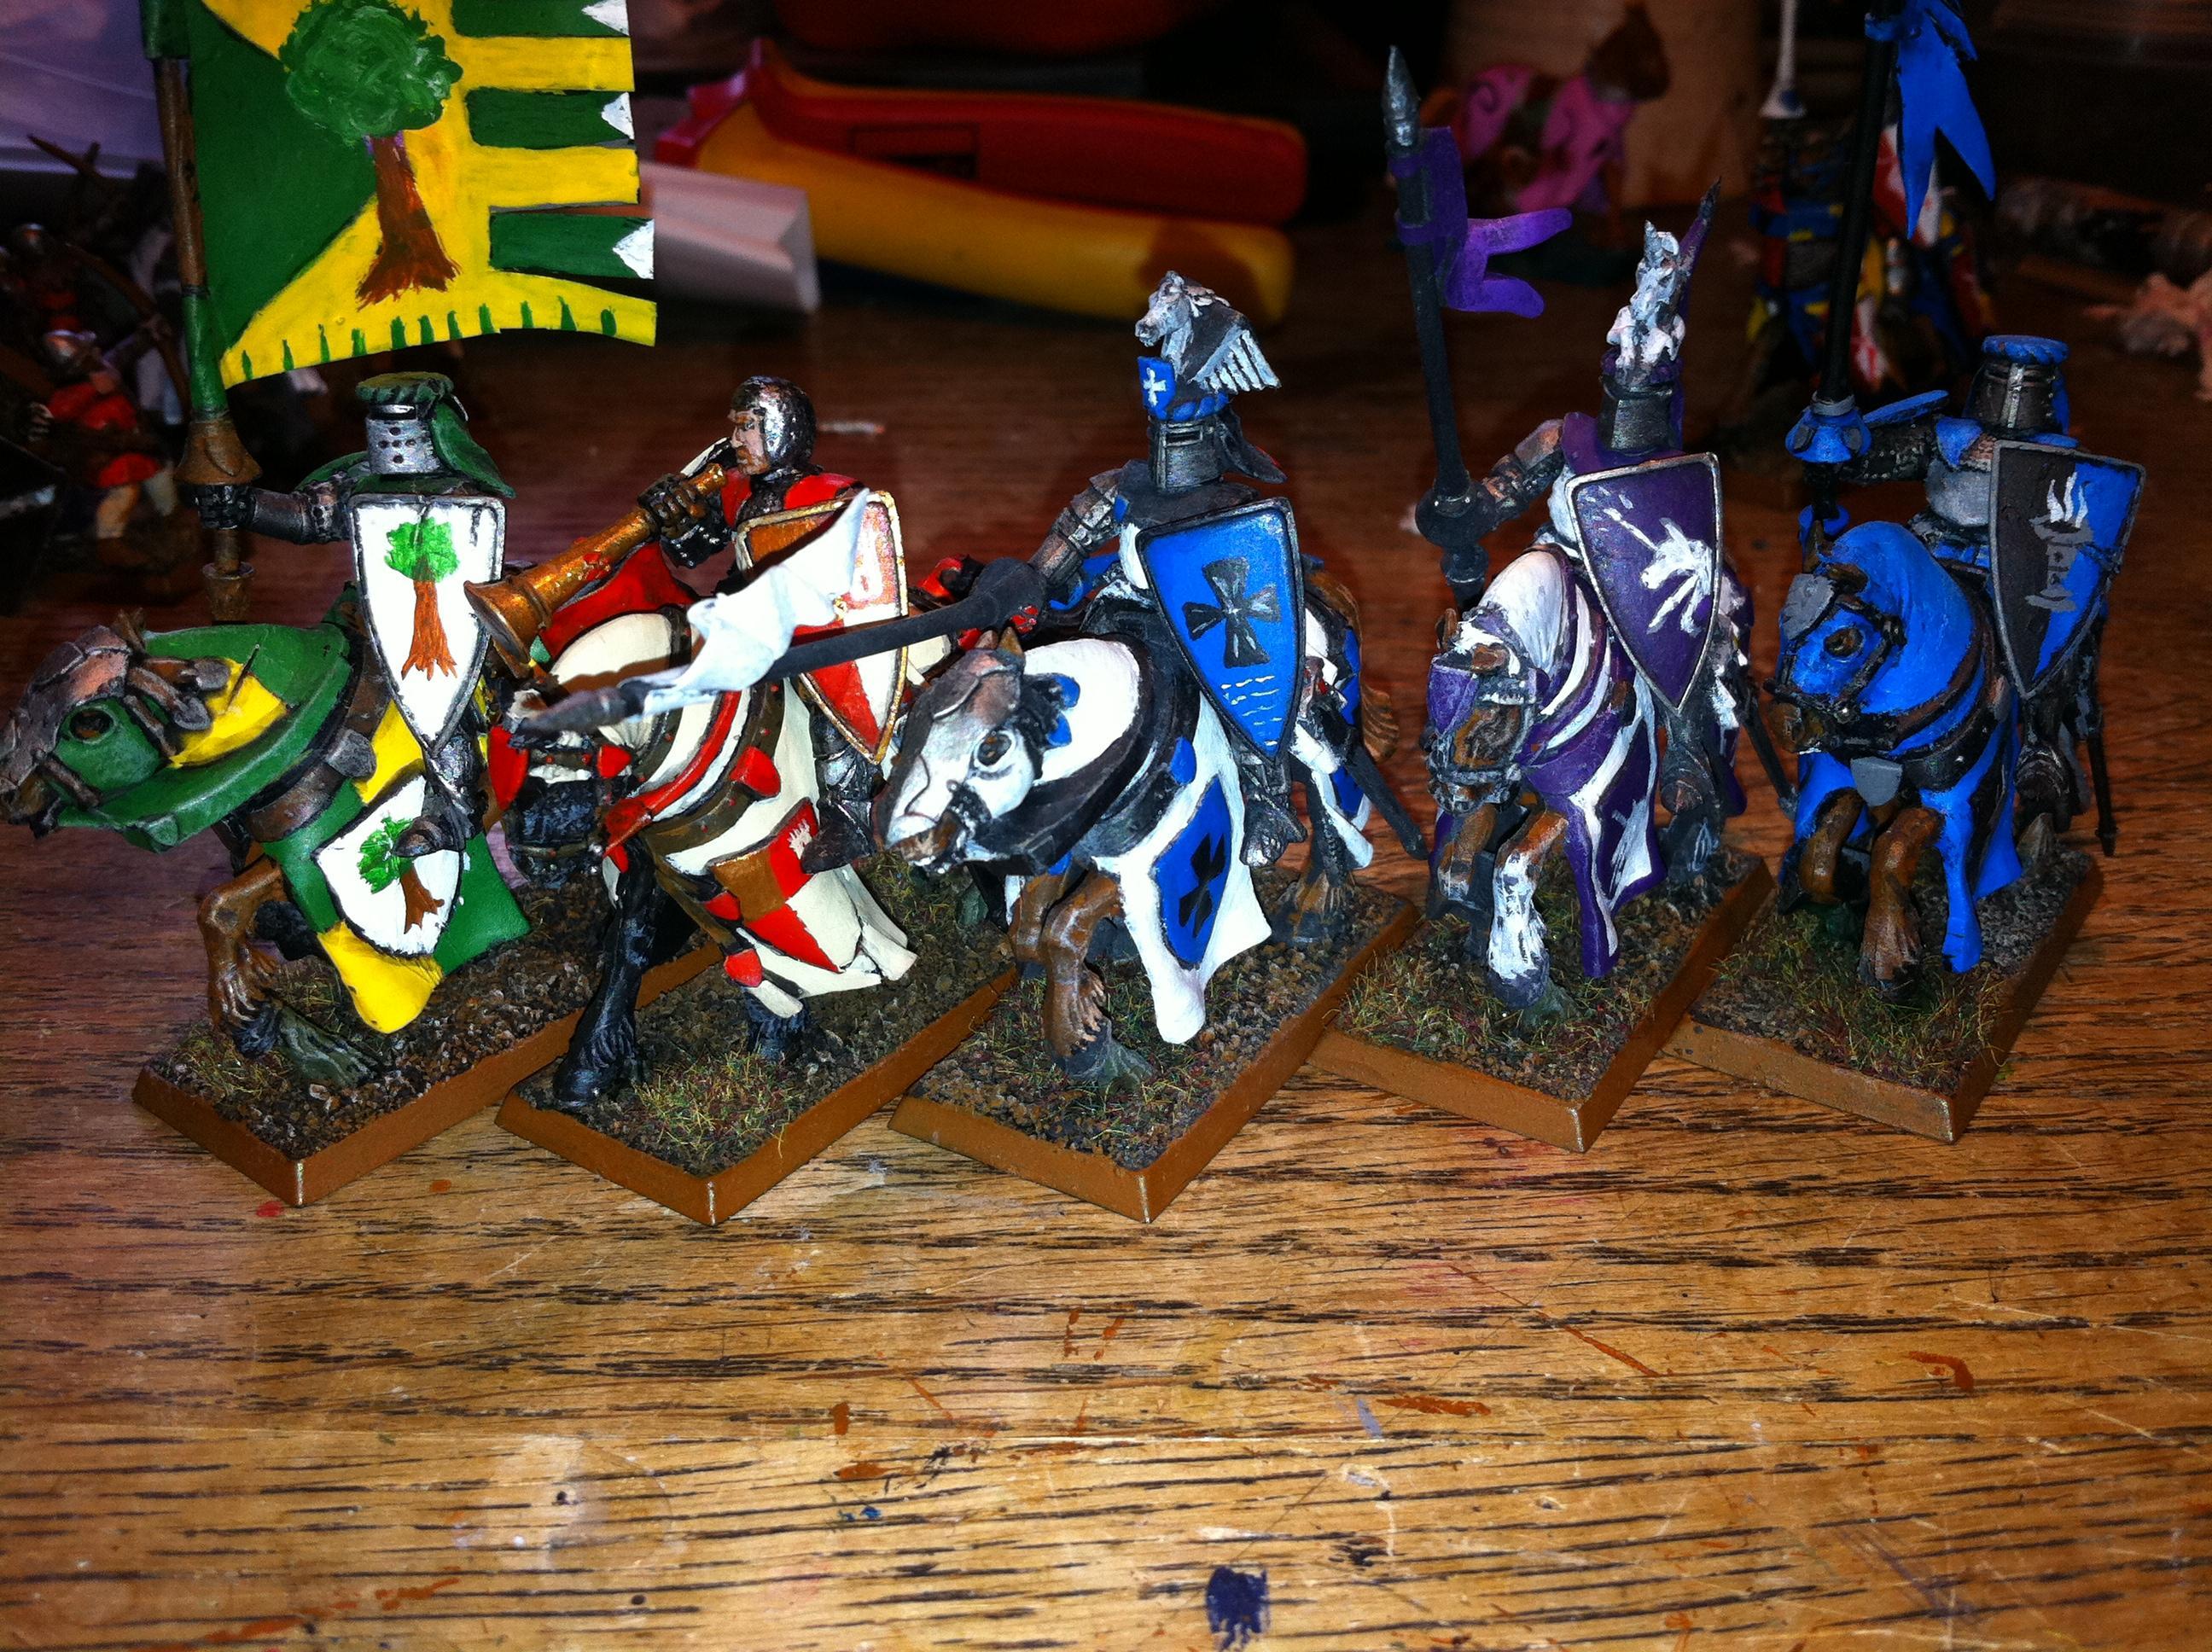 Archers, Arms, At, Bretonnians, Brets, Brettonnia, Damsel, Duke, Horses, Knights, Lord, Men, Paladin, Peasants, Warhammer Fantasy, Whf